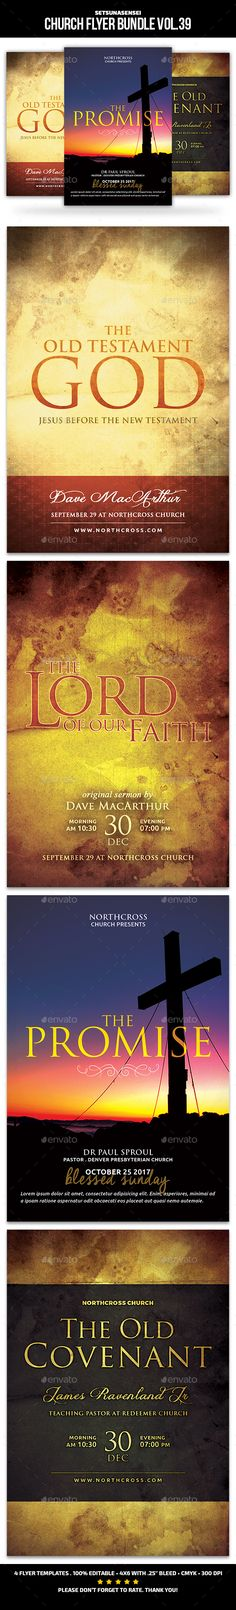 Church Flyer Bundle Vol. 39